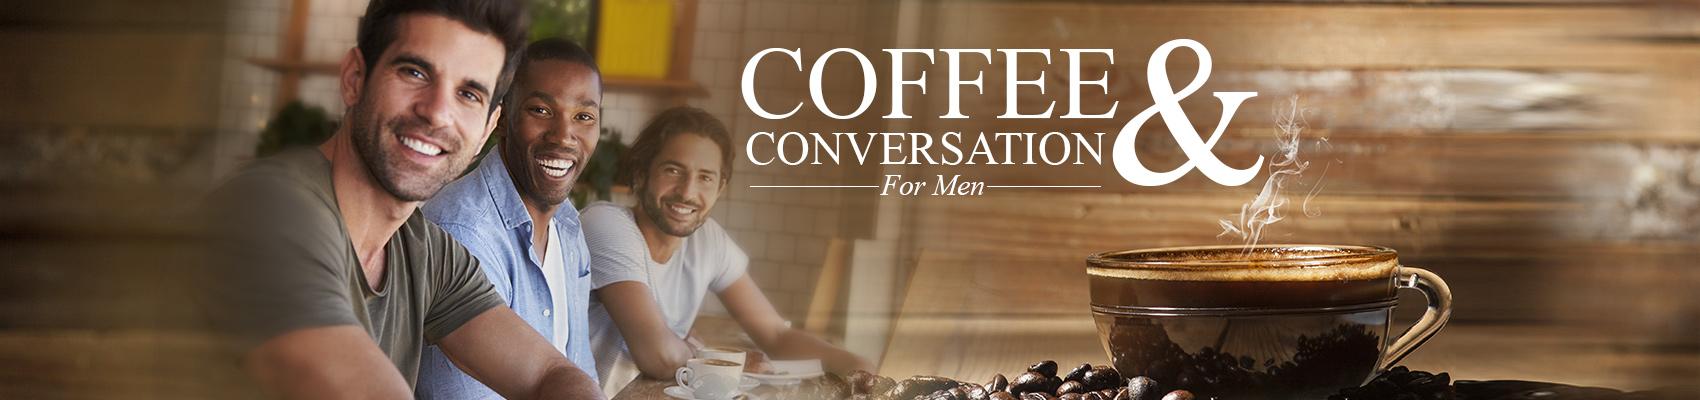 slide_coffee_and_conversation